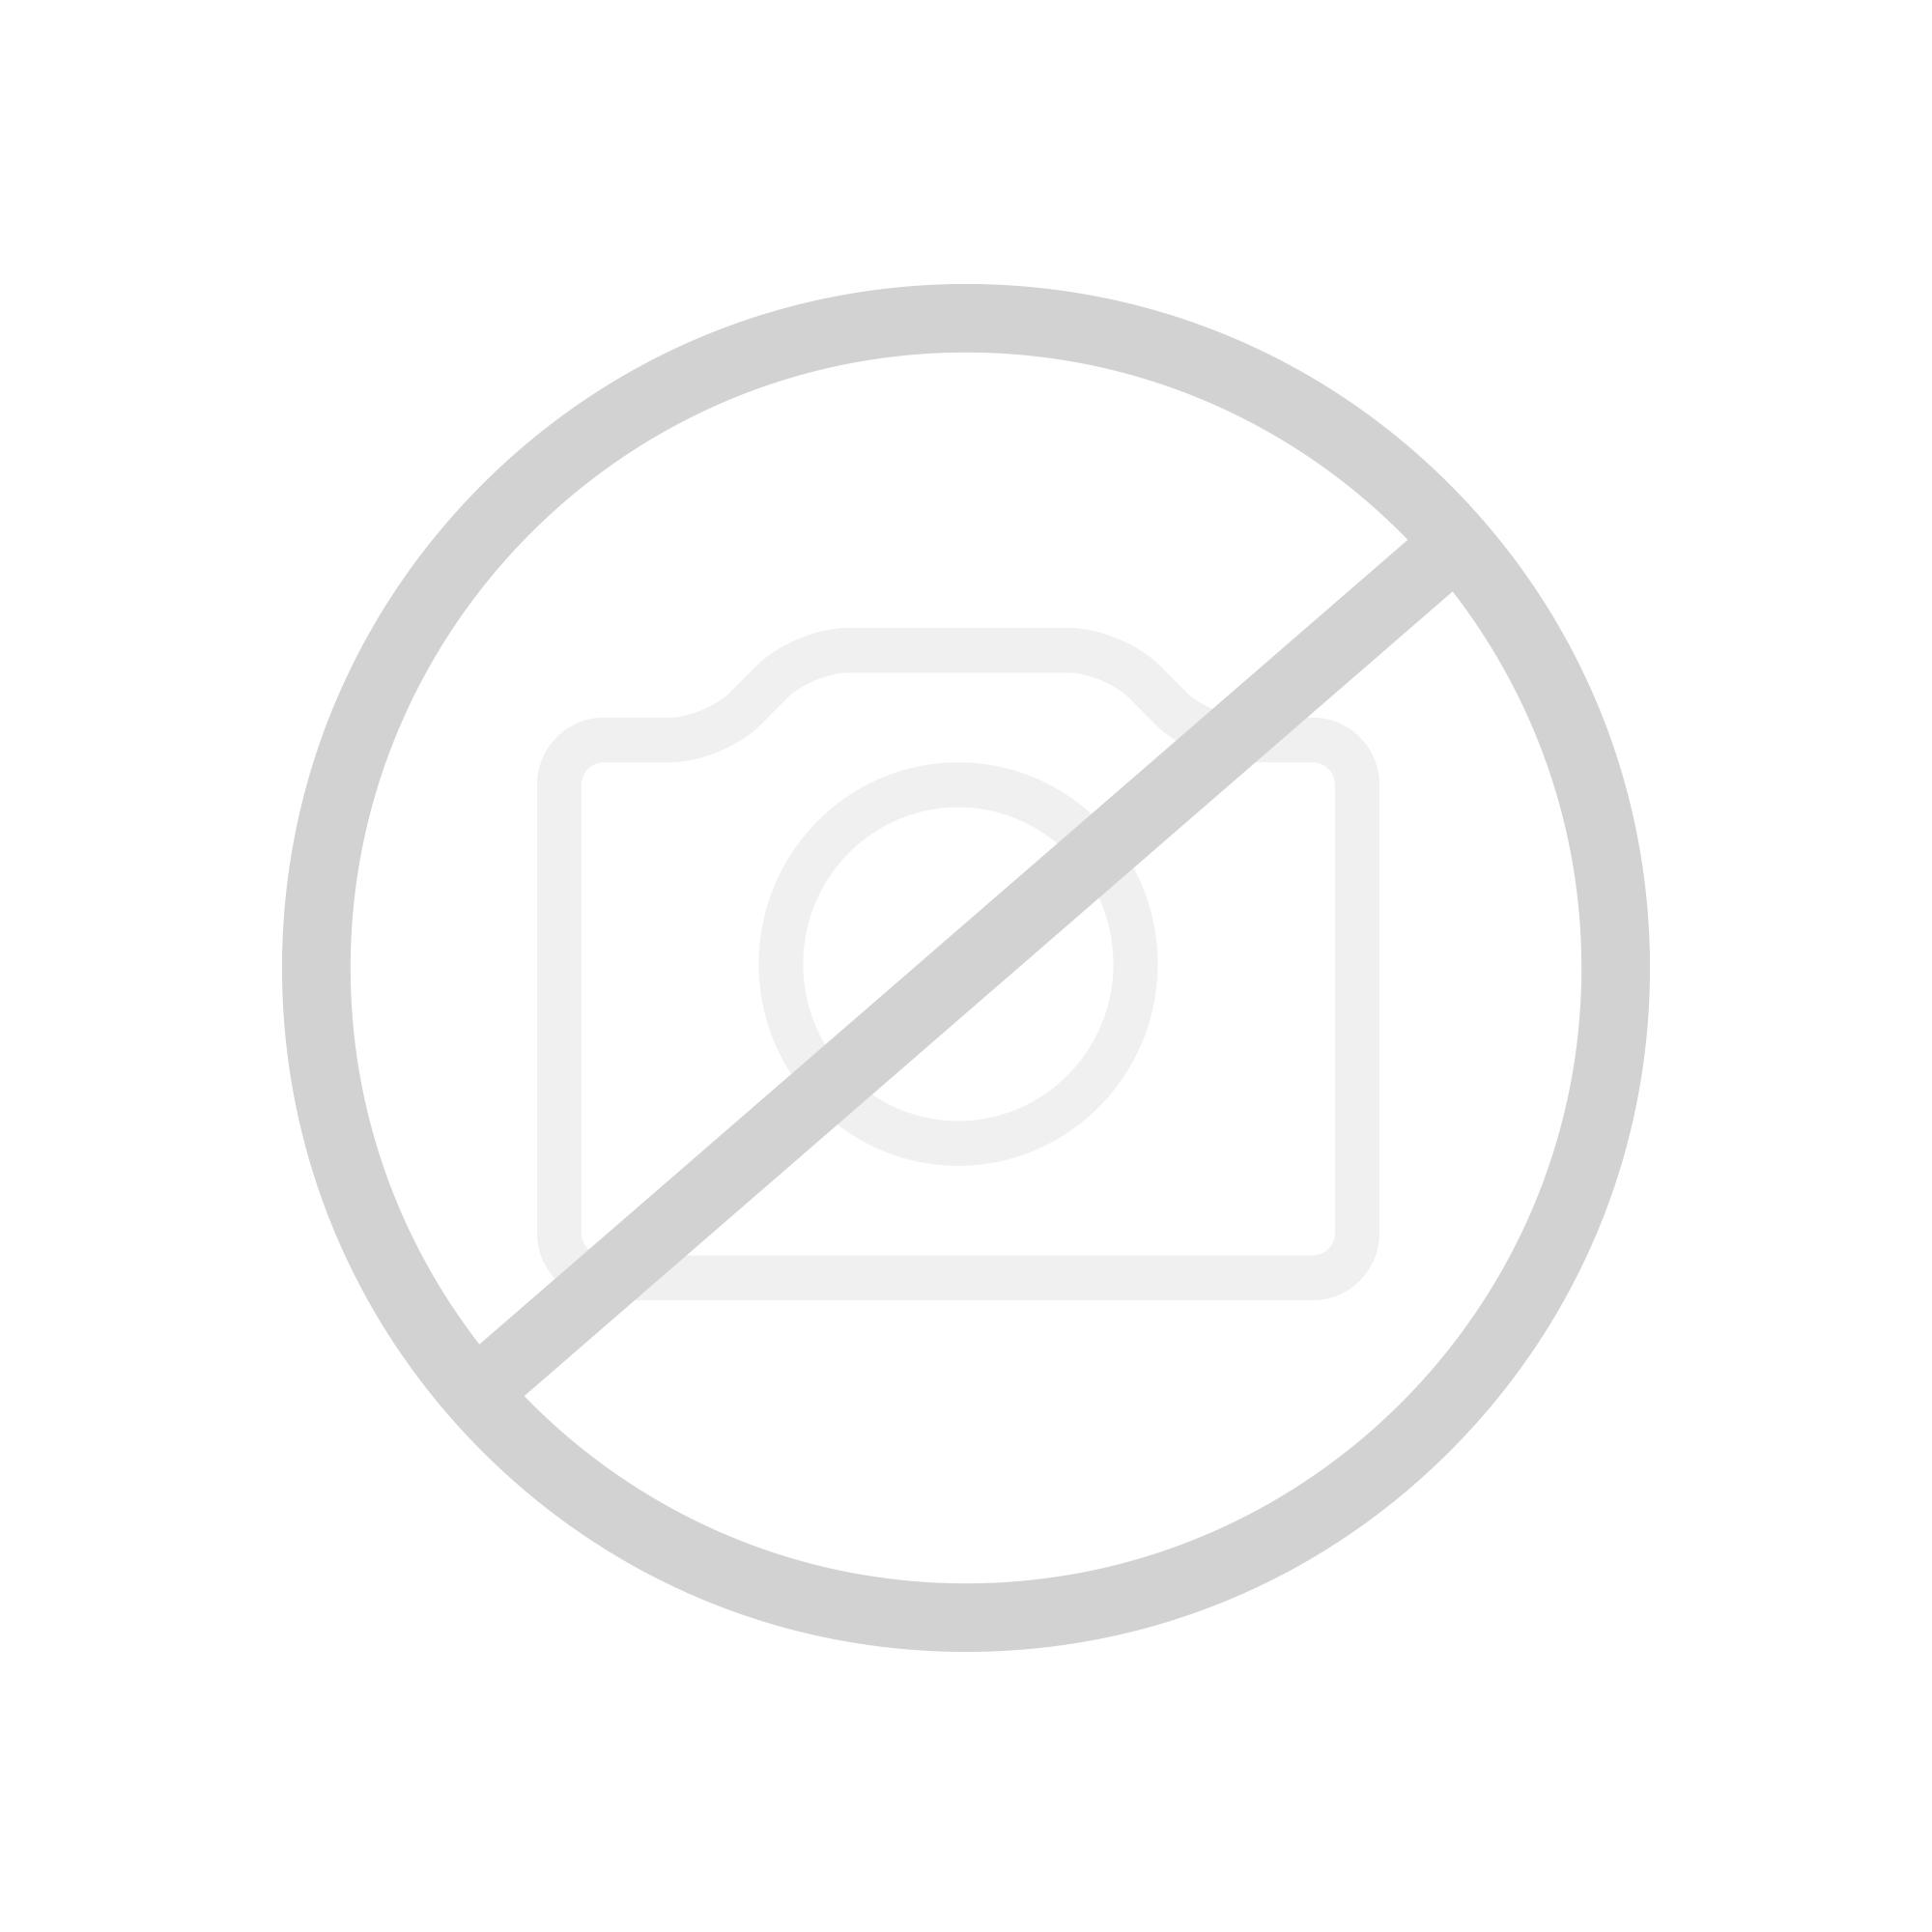 herzbach design ix neocastell ix b rstengarnitur wandh ngend reuter onlineshop. Black Bedroom Furniture Sets. Home Design Ideas